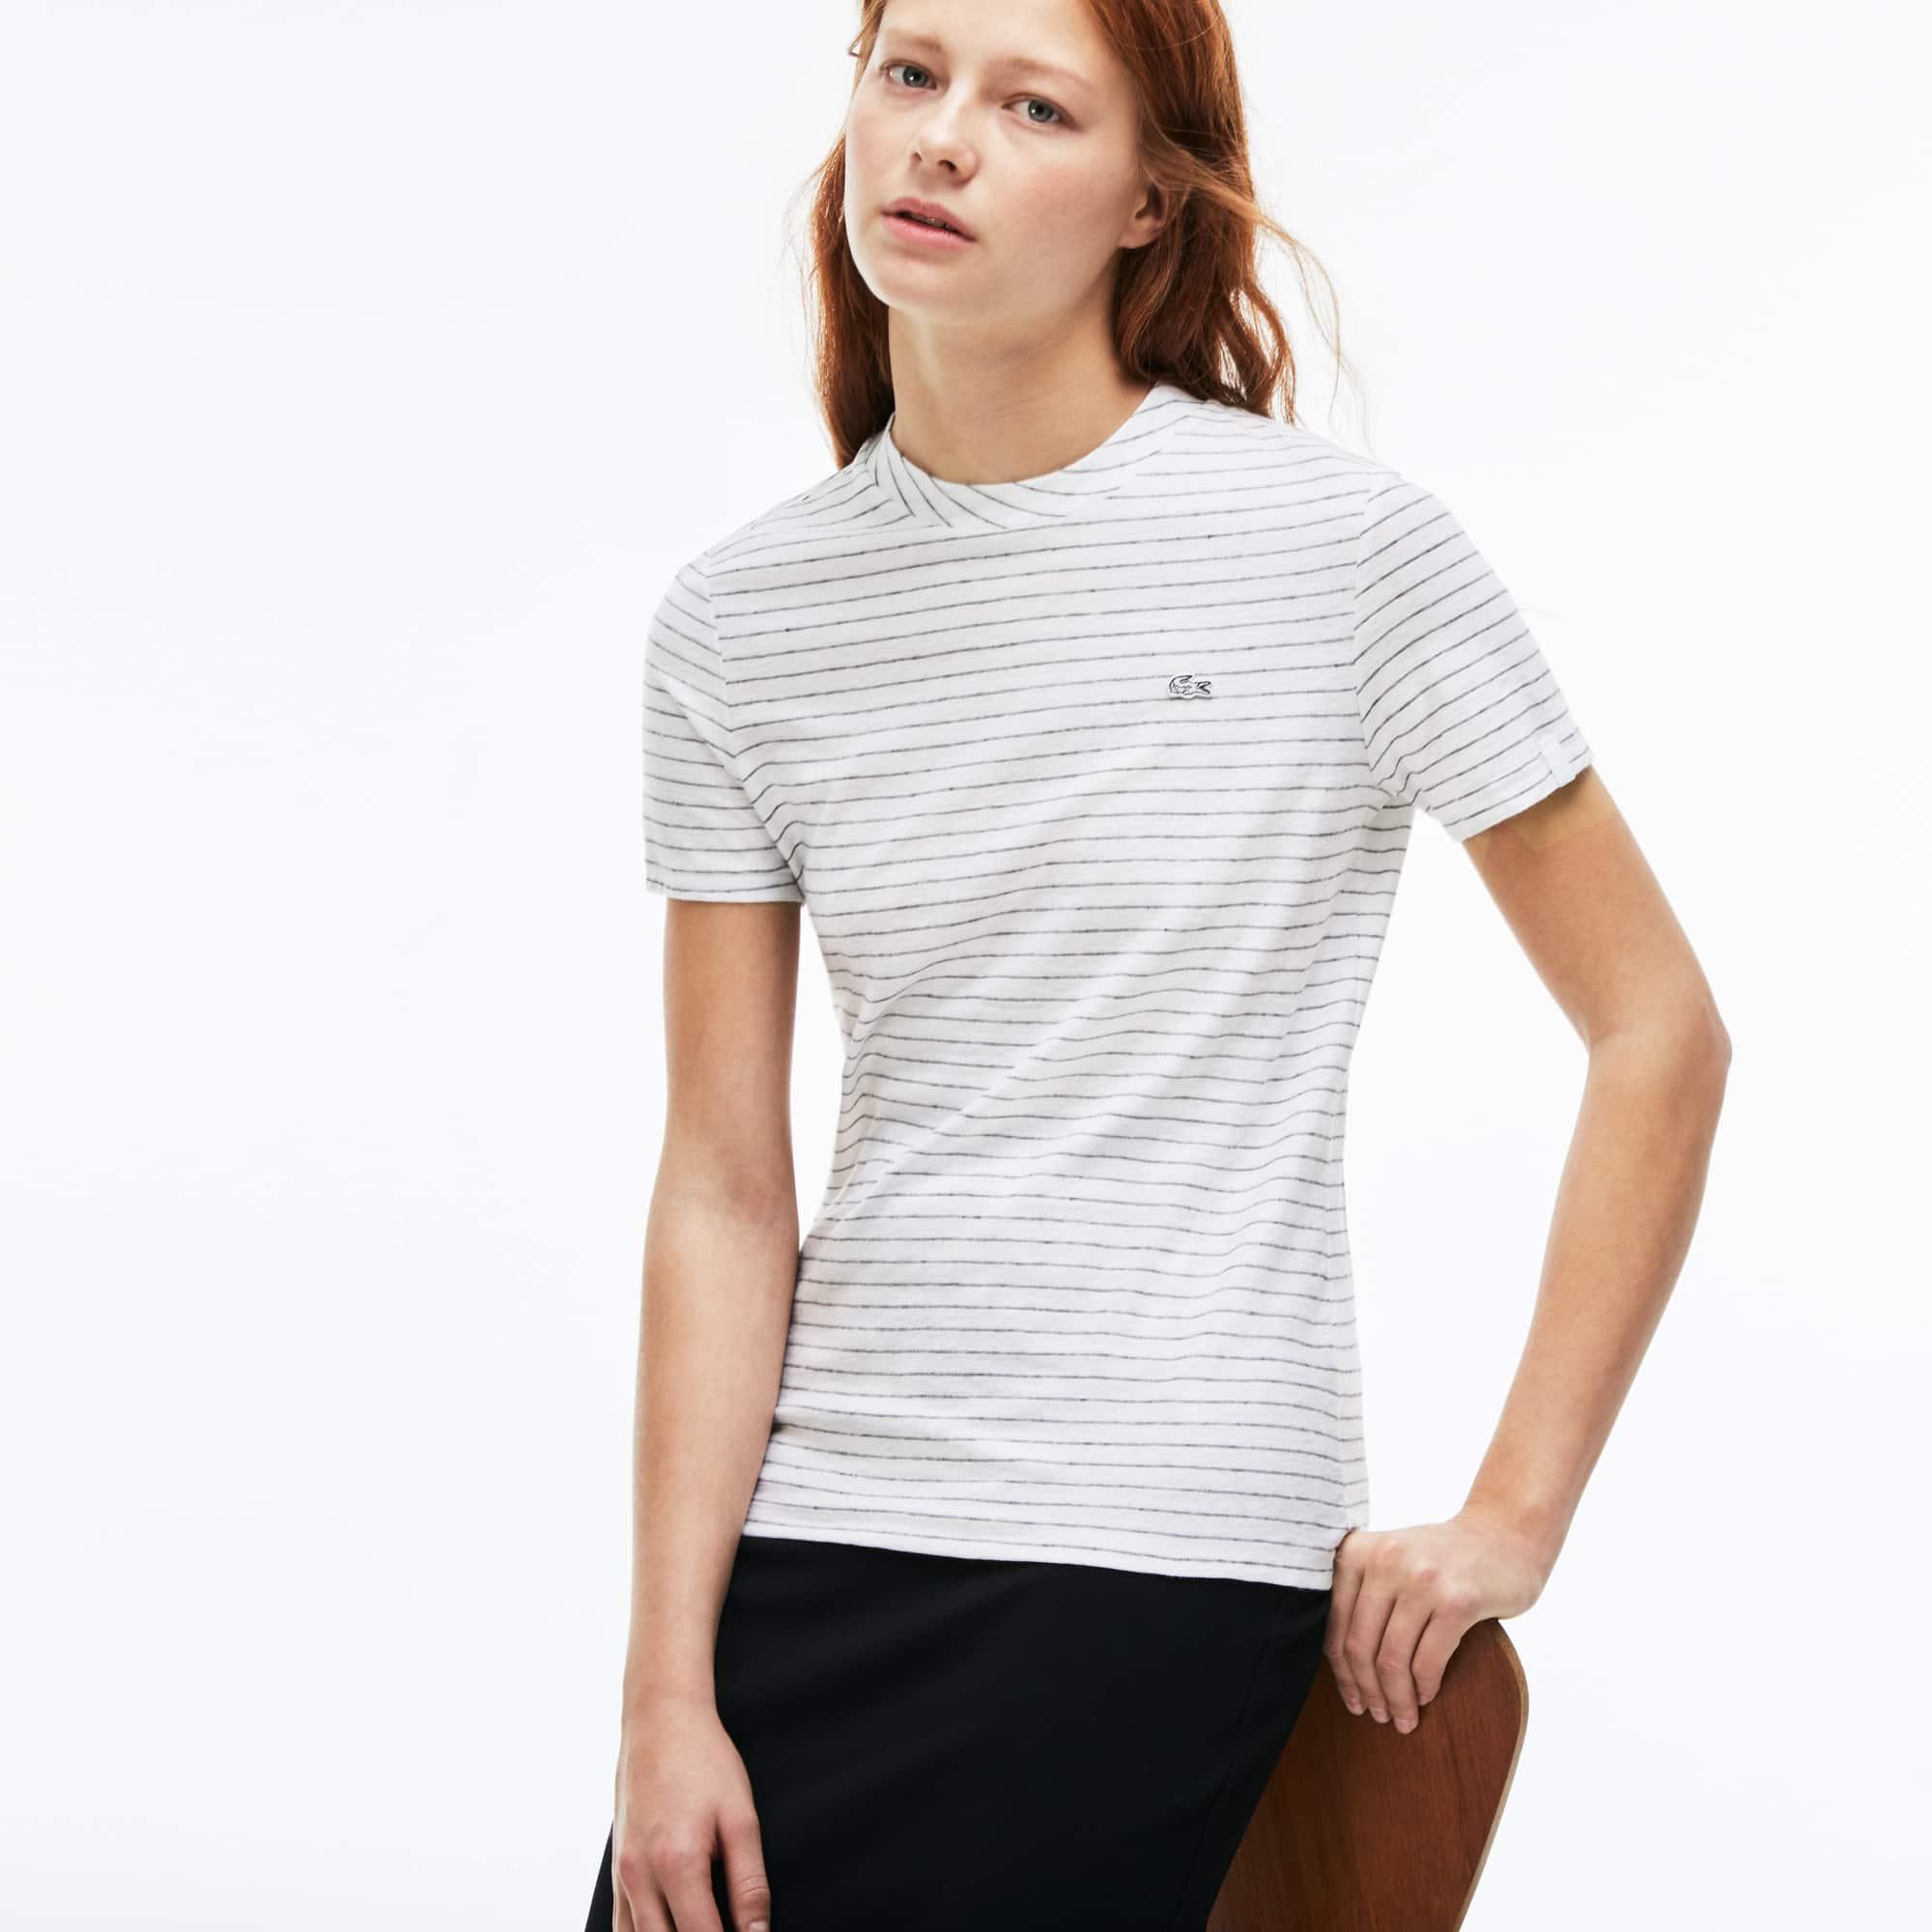 Women's Lacoste LIVE Crew Neck Striped Cotton And Linen T-shirt